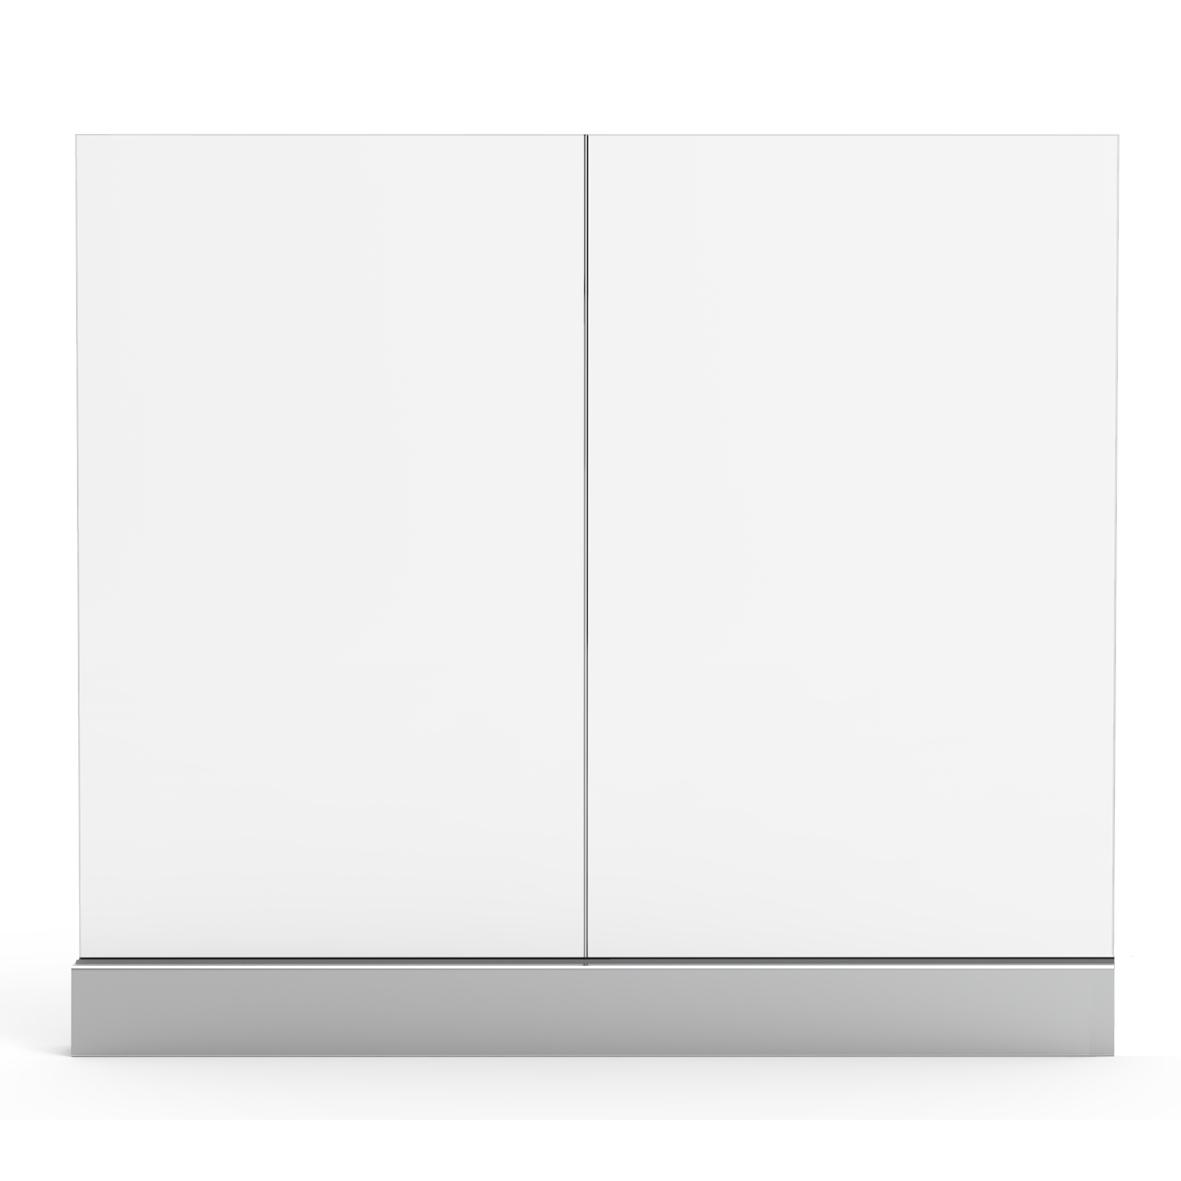 https://www.allpaint.it/wp-content/uploads/2021/07/ringhiere-alluminio-tg200-allpaint.jpg